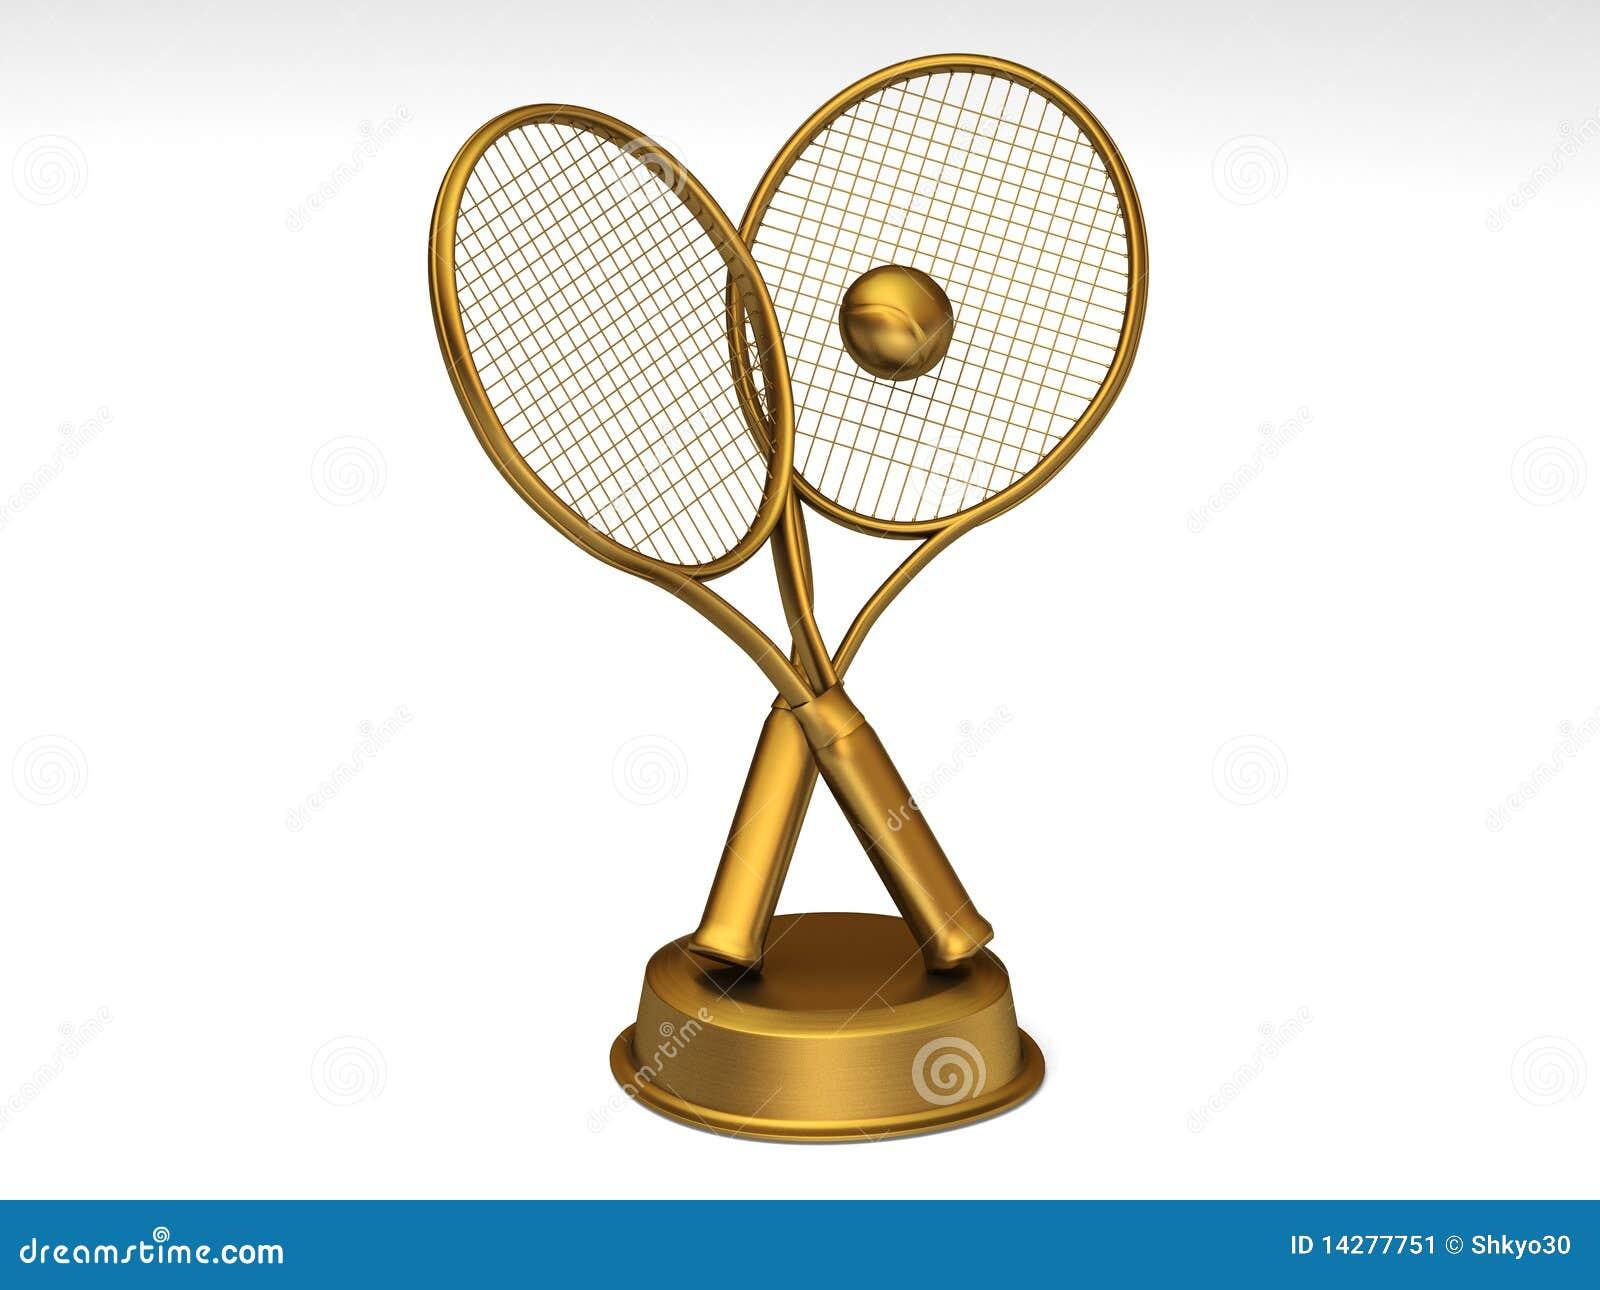 Golden Tennis Trophy Stock Image Illustration Of Golden